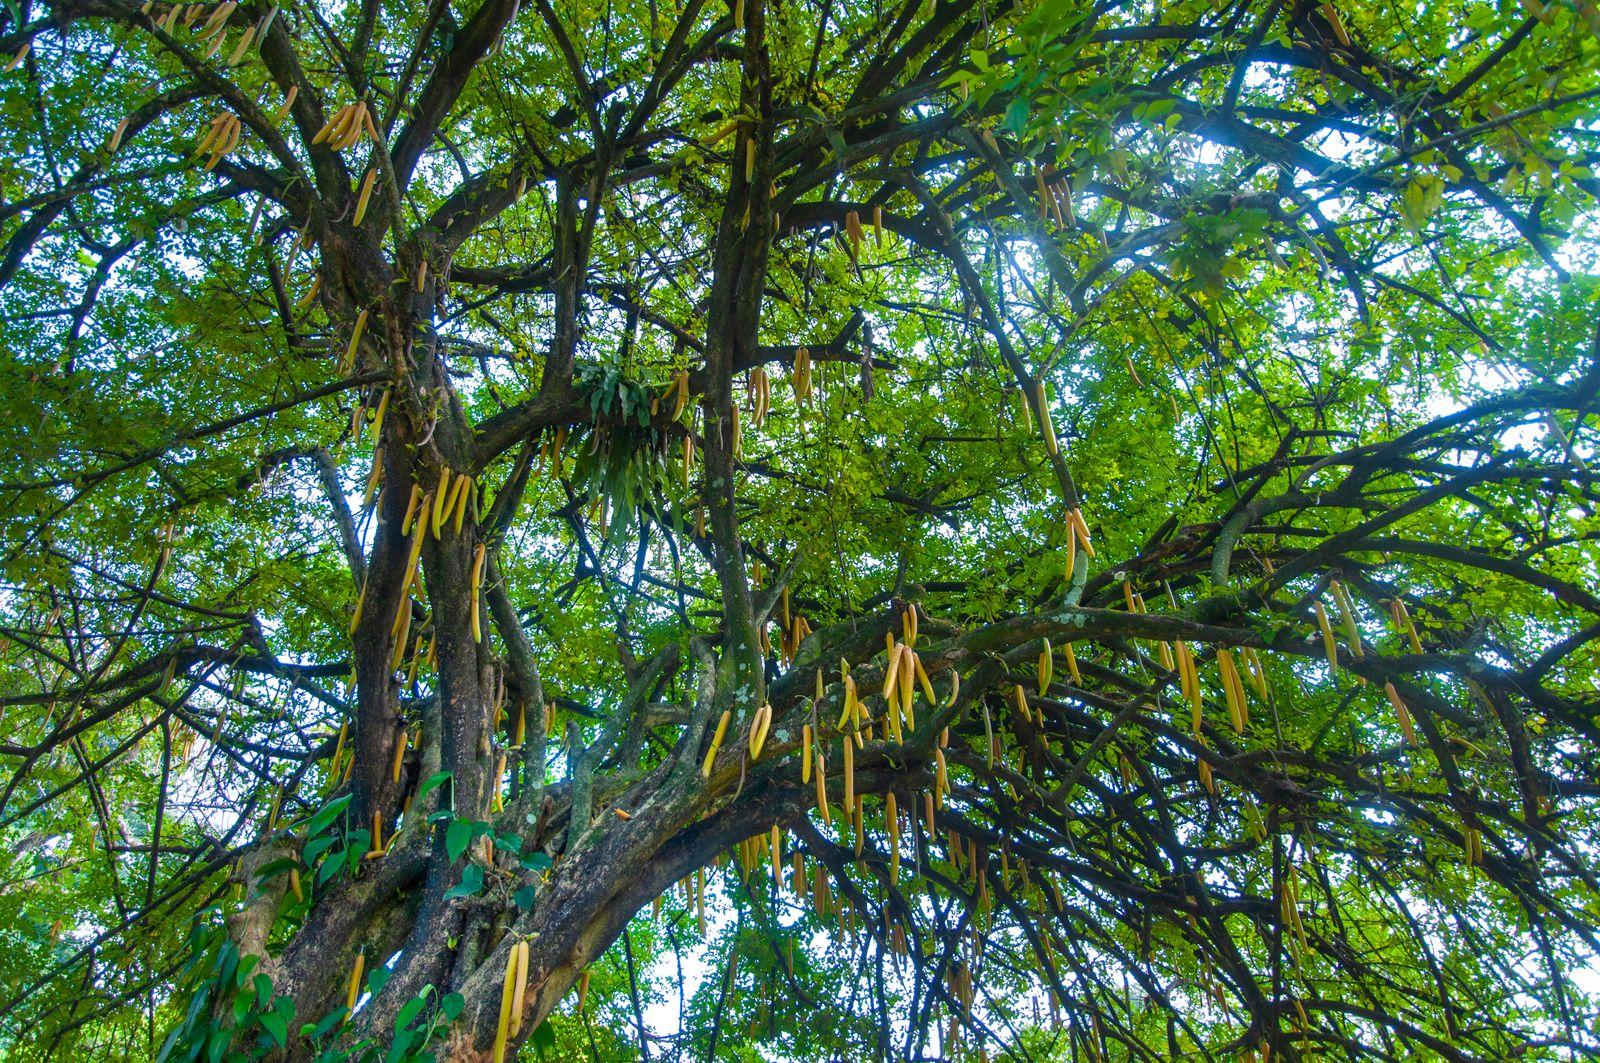 Tropical green plant of Horseradishtree (Moringa oleifera)